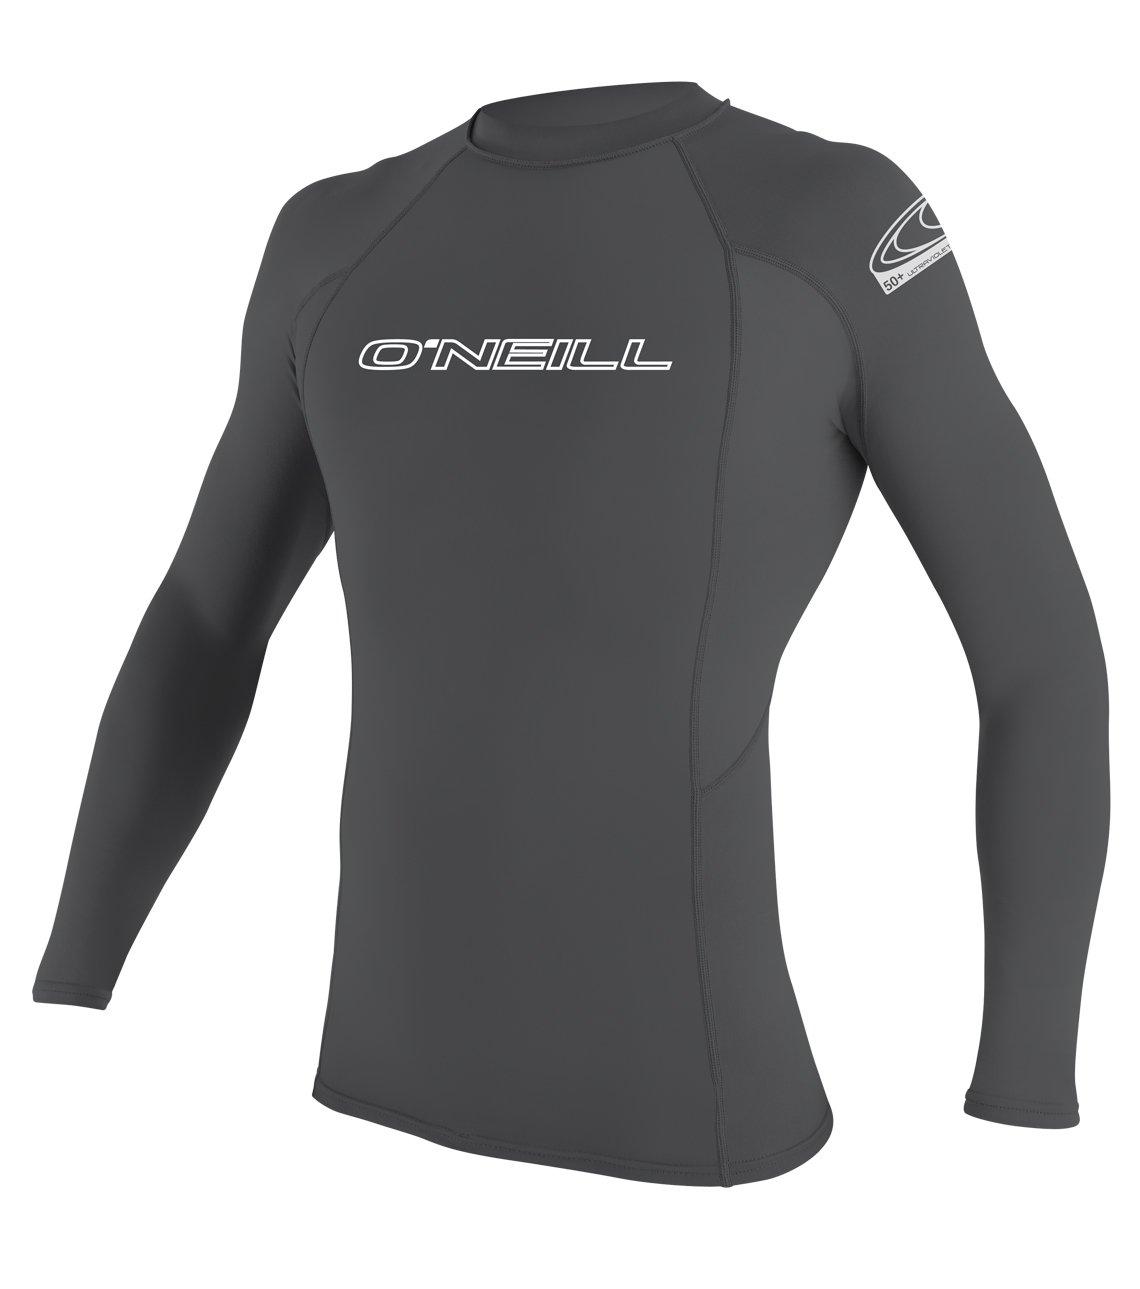 O'Neill Men's Basic Skins UPF 50+ Long Sleeve Rash Guard, Smoke, Small